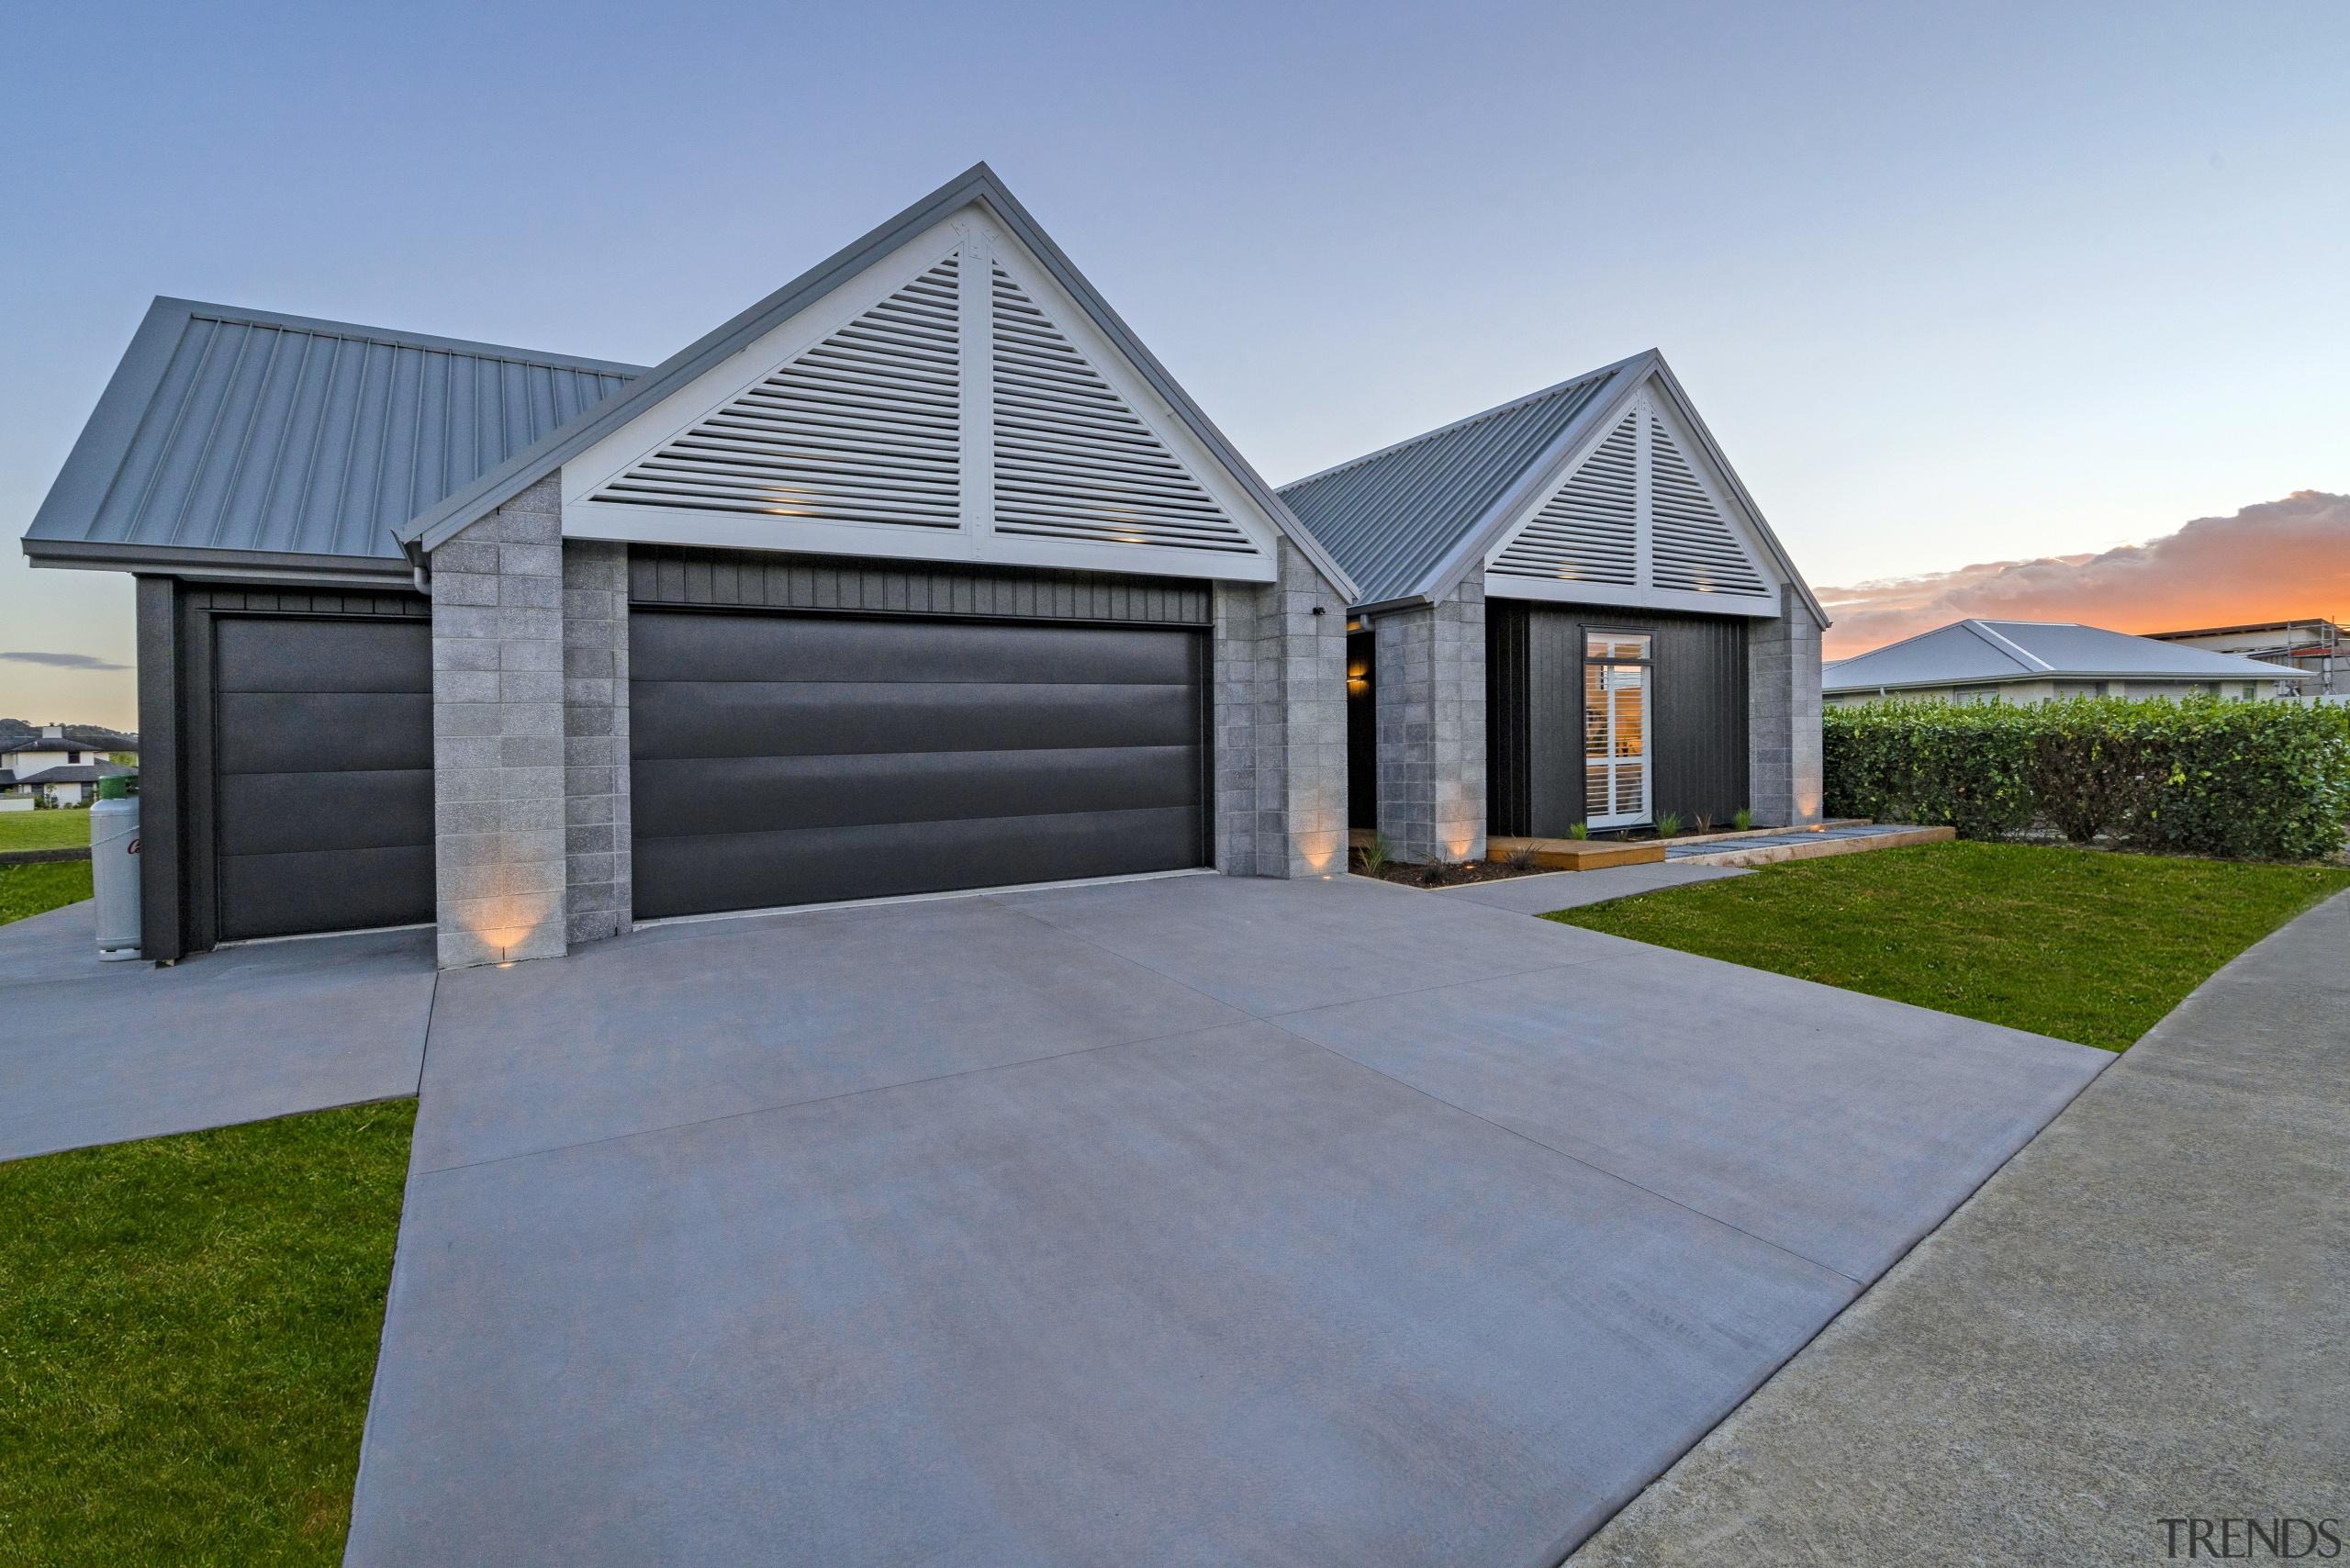 Landmark Homes often use popular Linea facings, and home, house, property, real estate, residential area, landmark homes, showhome, Coromandel, Linea cladding